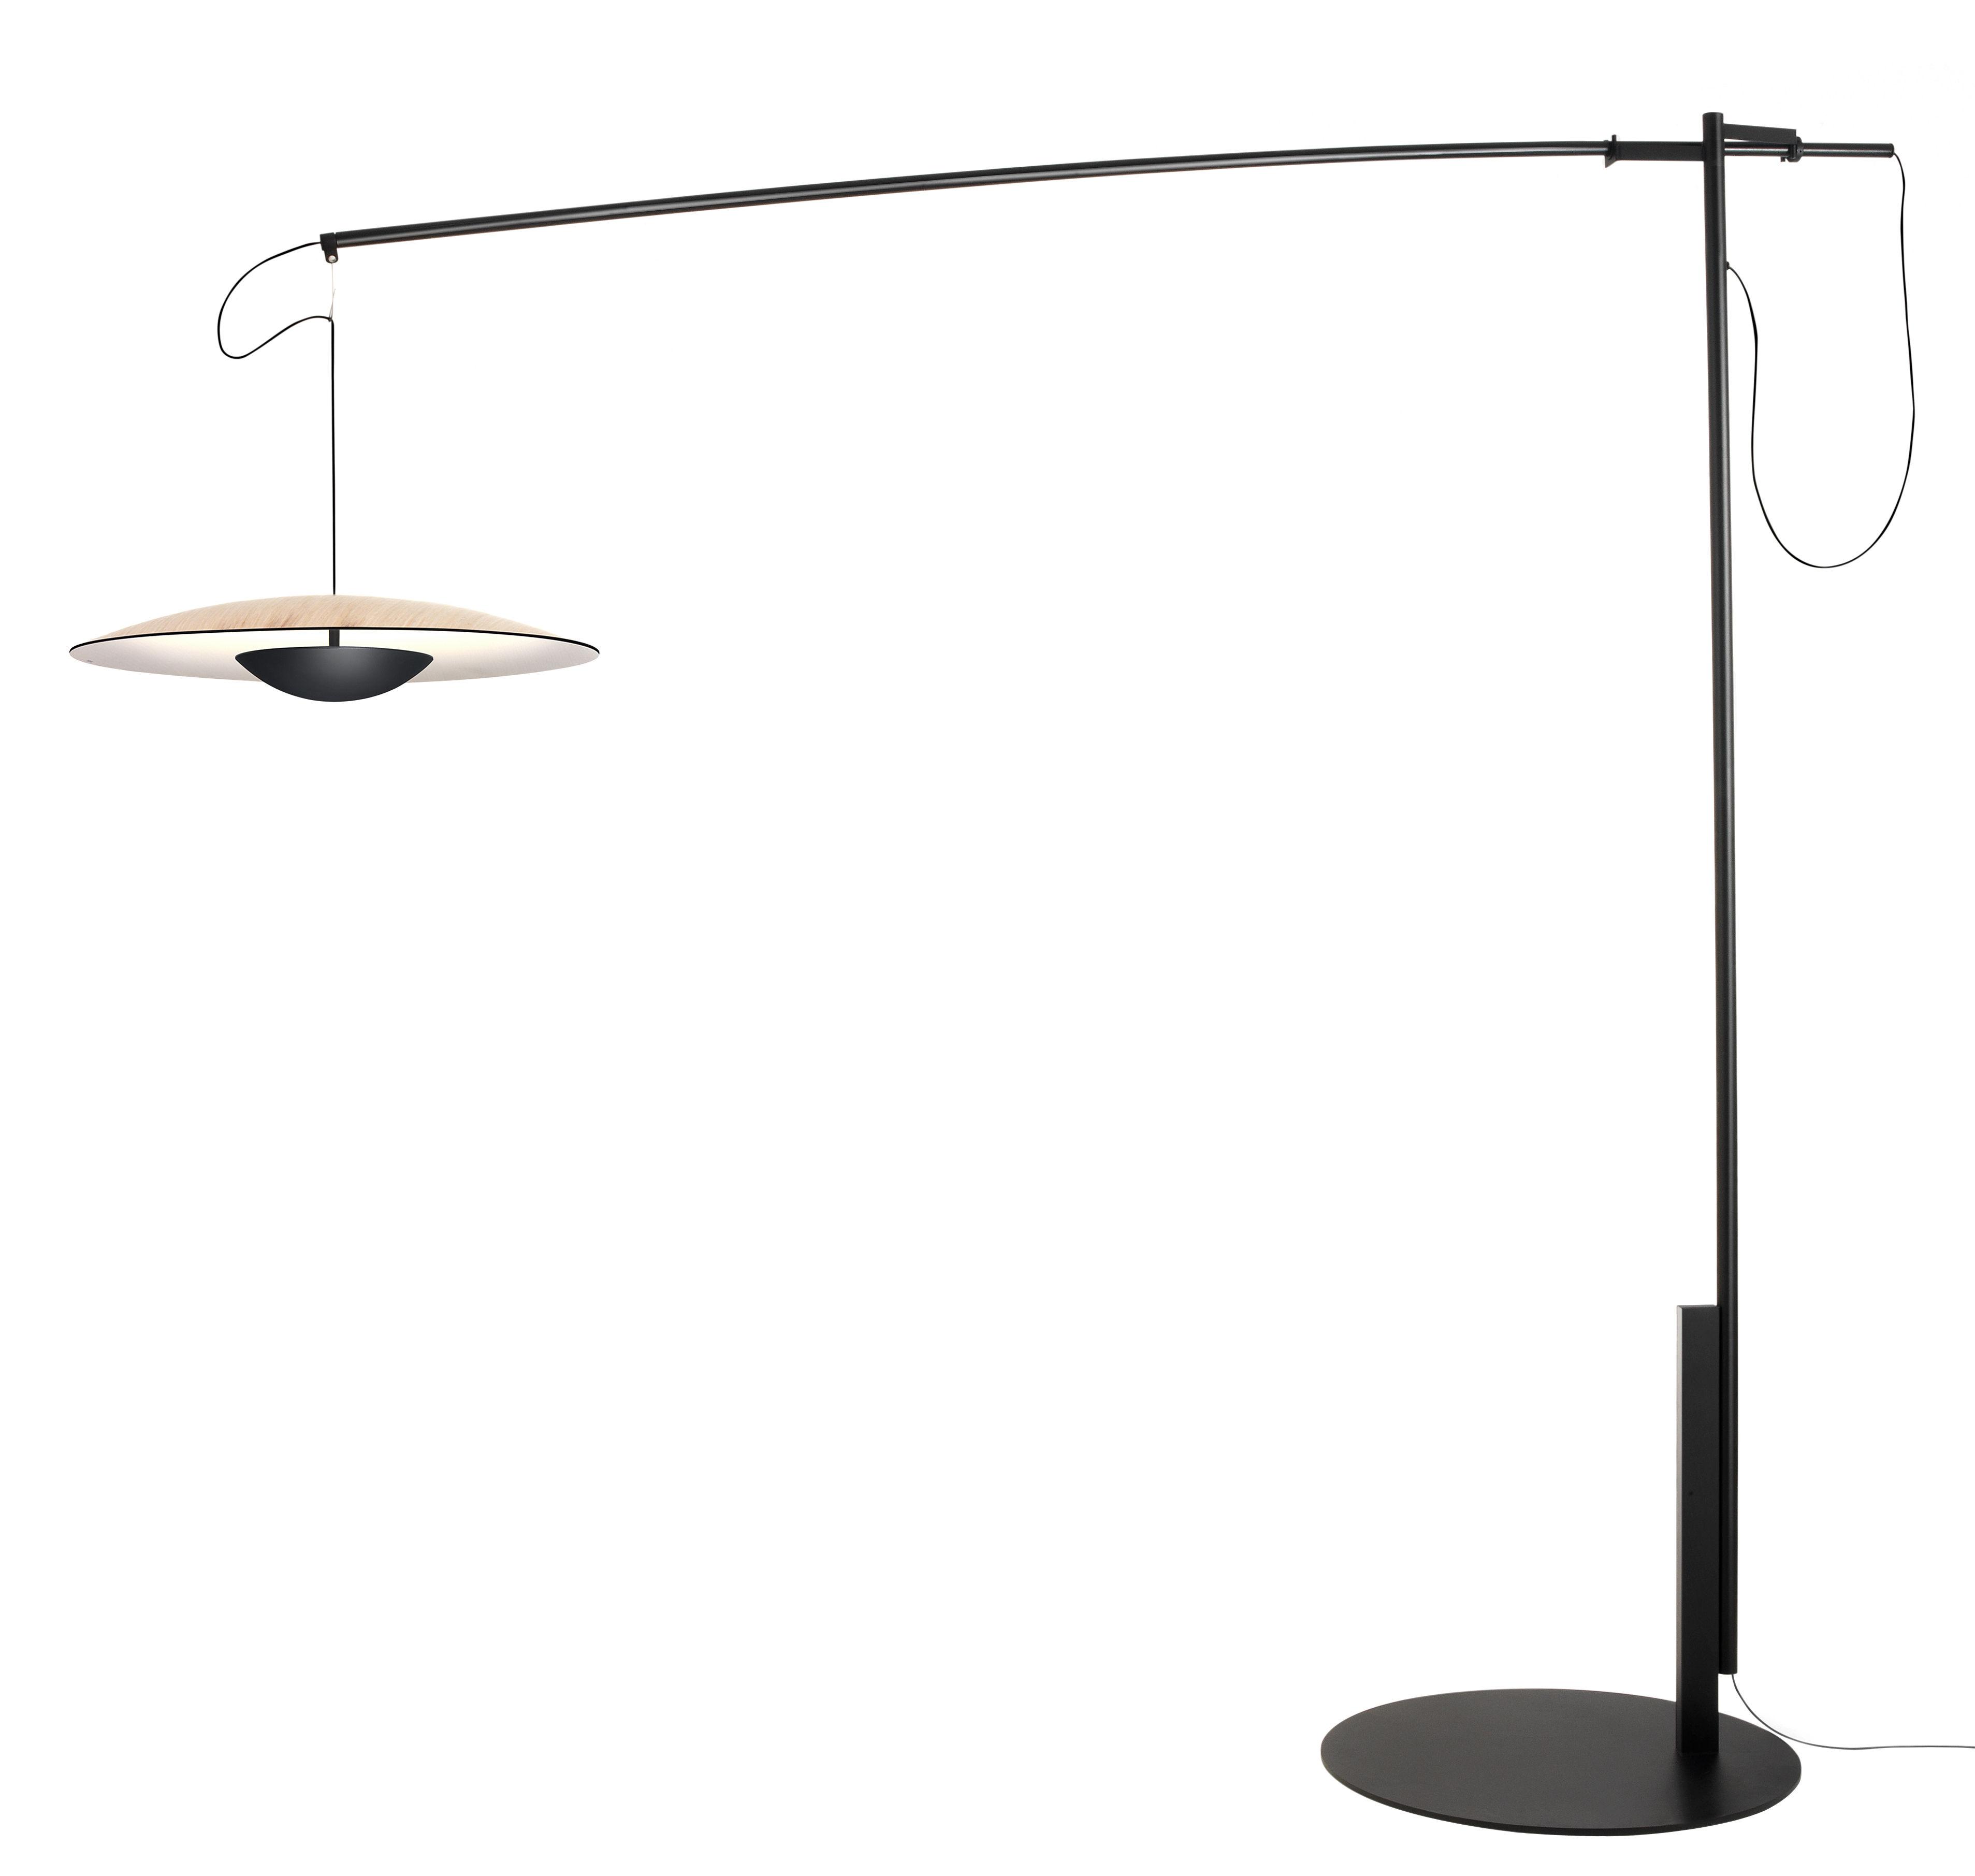 Lighting - Floor lamps - Ginger XL Floor lamp by Marset - Oak / Black - Carbon fibre, Metal, Plywood